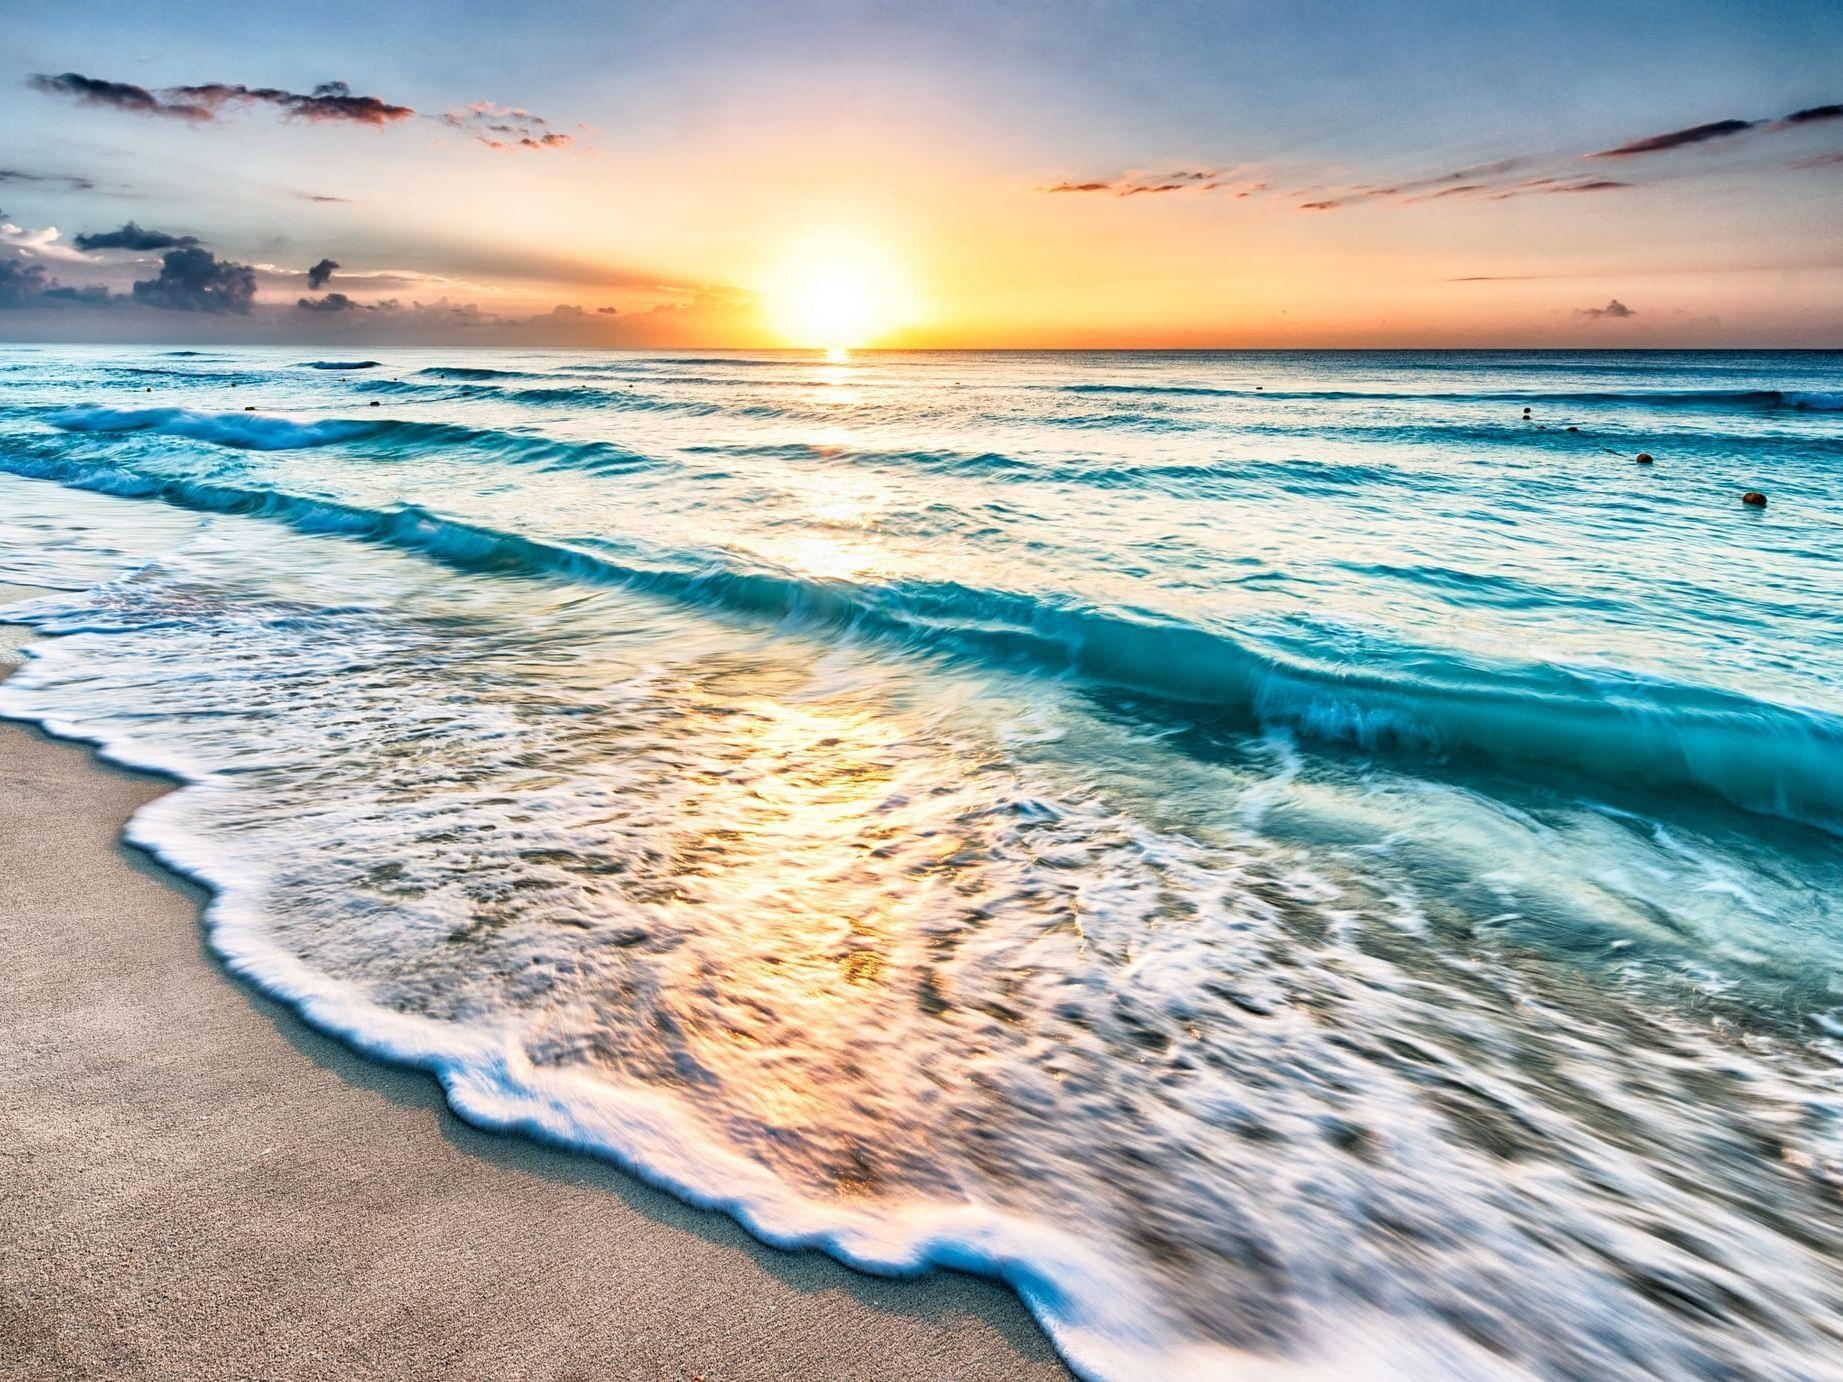 View of ocean at sunset near Daydream Island Resort